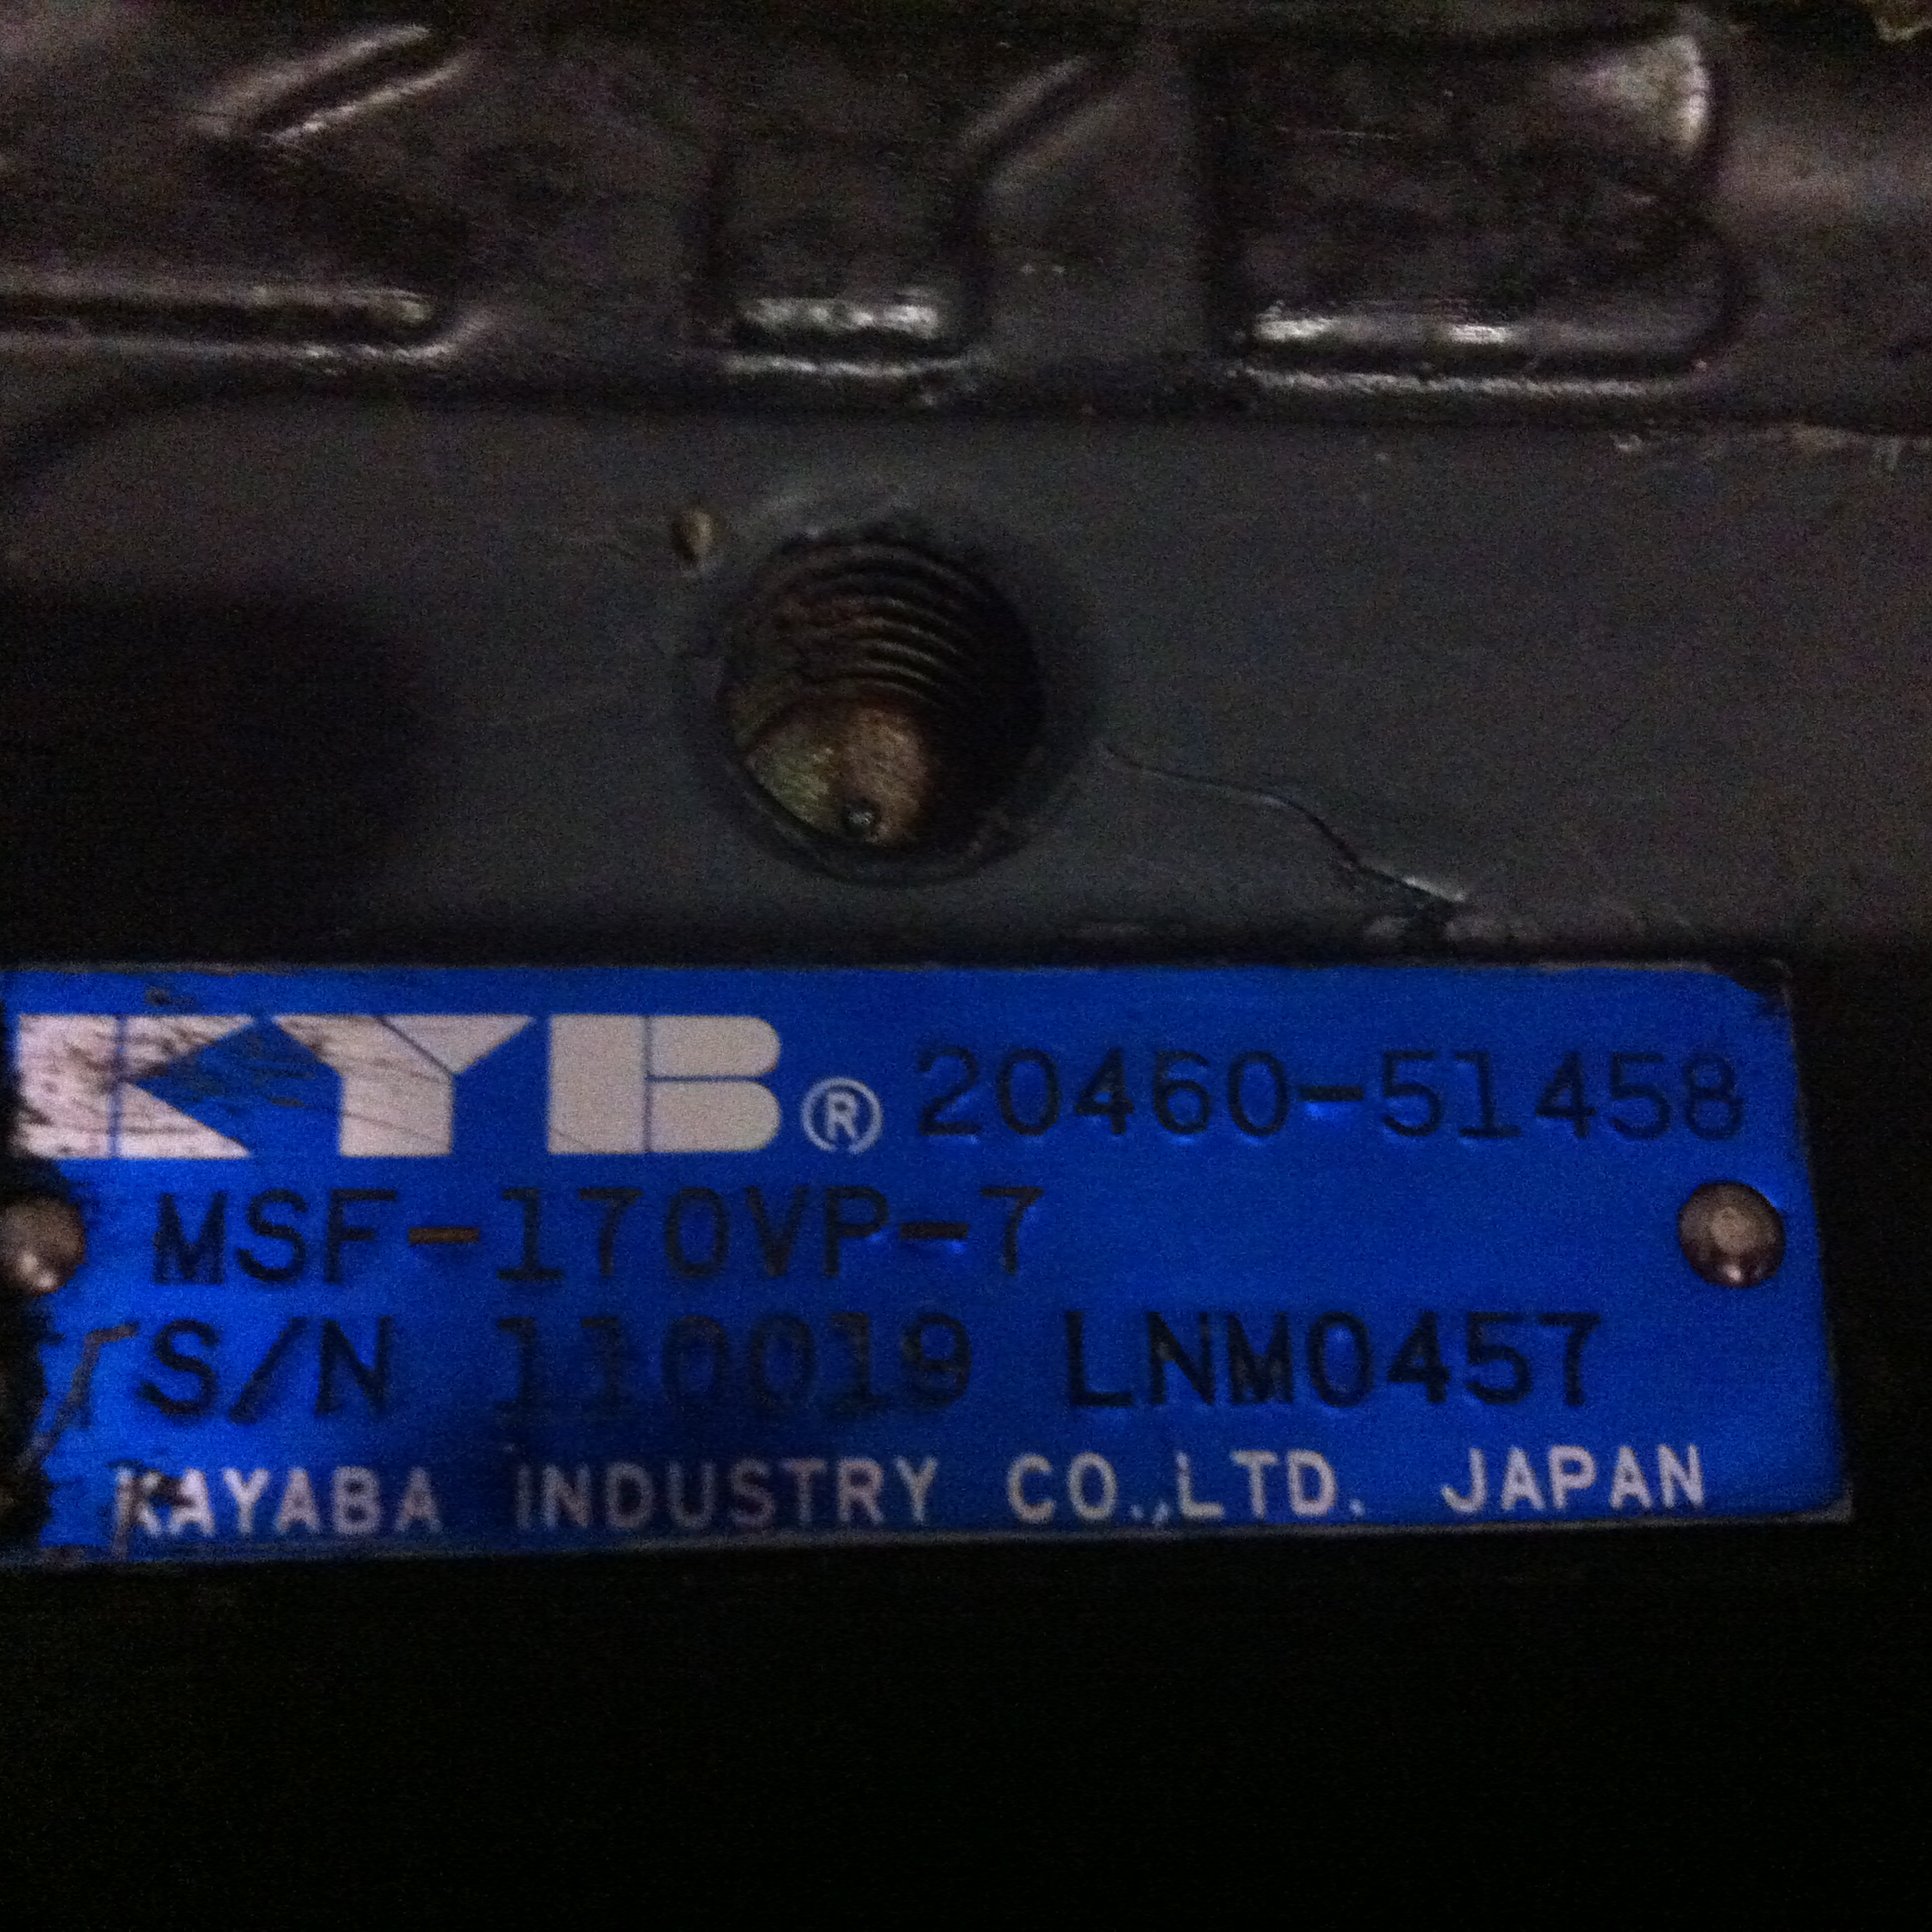 Гидромотор редуктора хода для экскаваторов Хитачи, Hitachi, Jcb